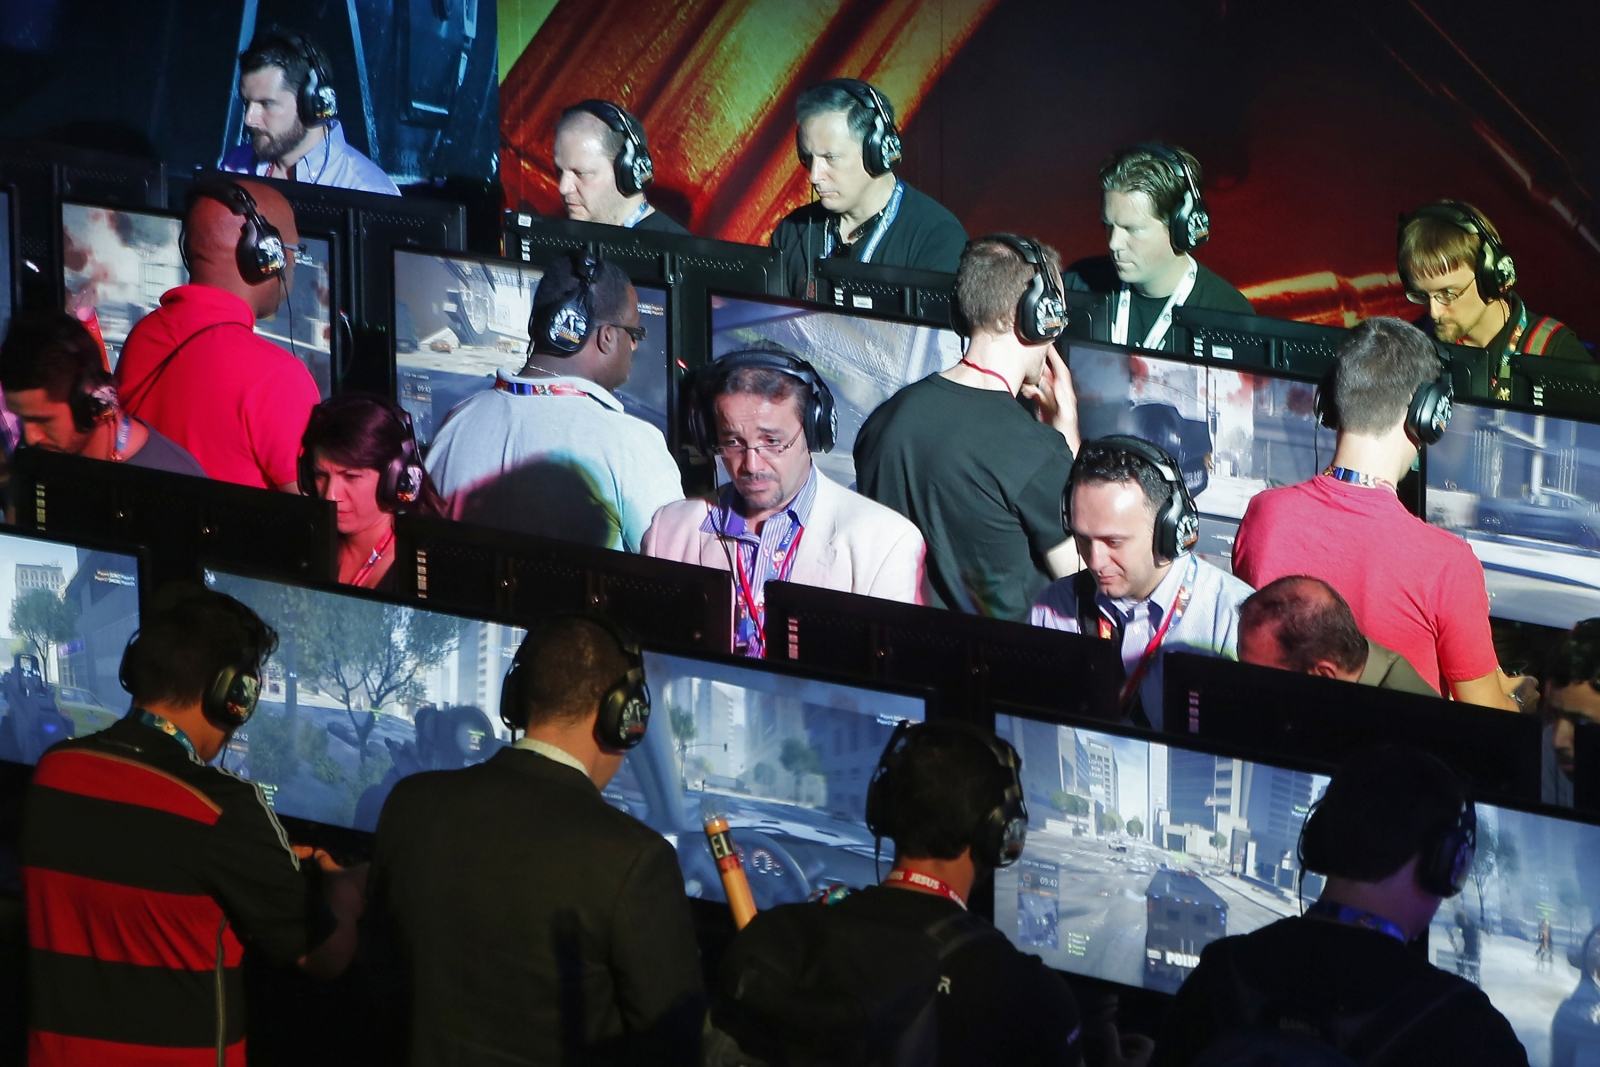 Profesional en Counter Strike:GO se droga para jugar mejor